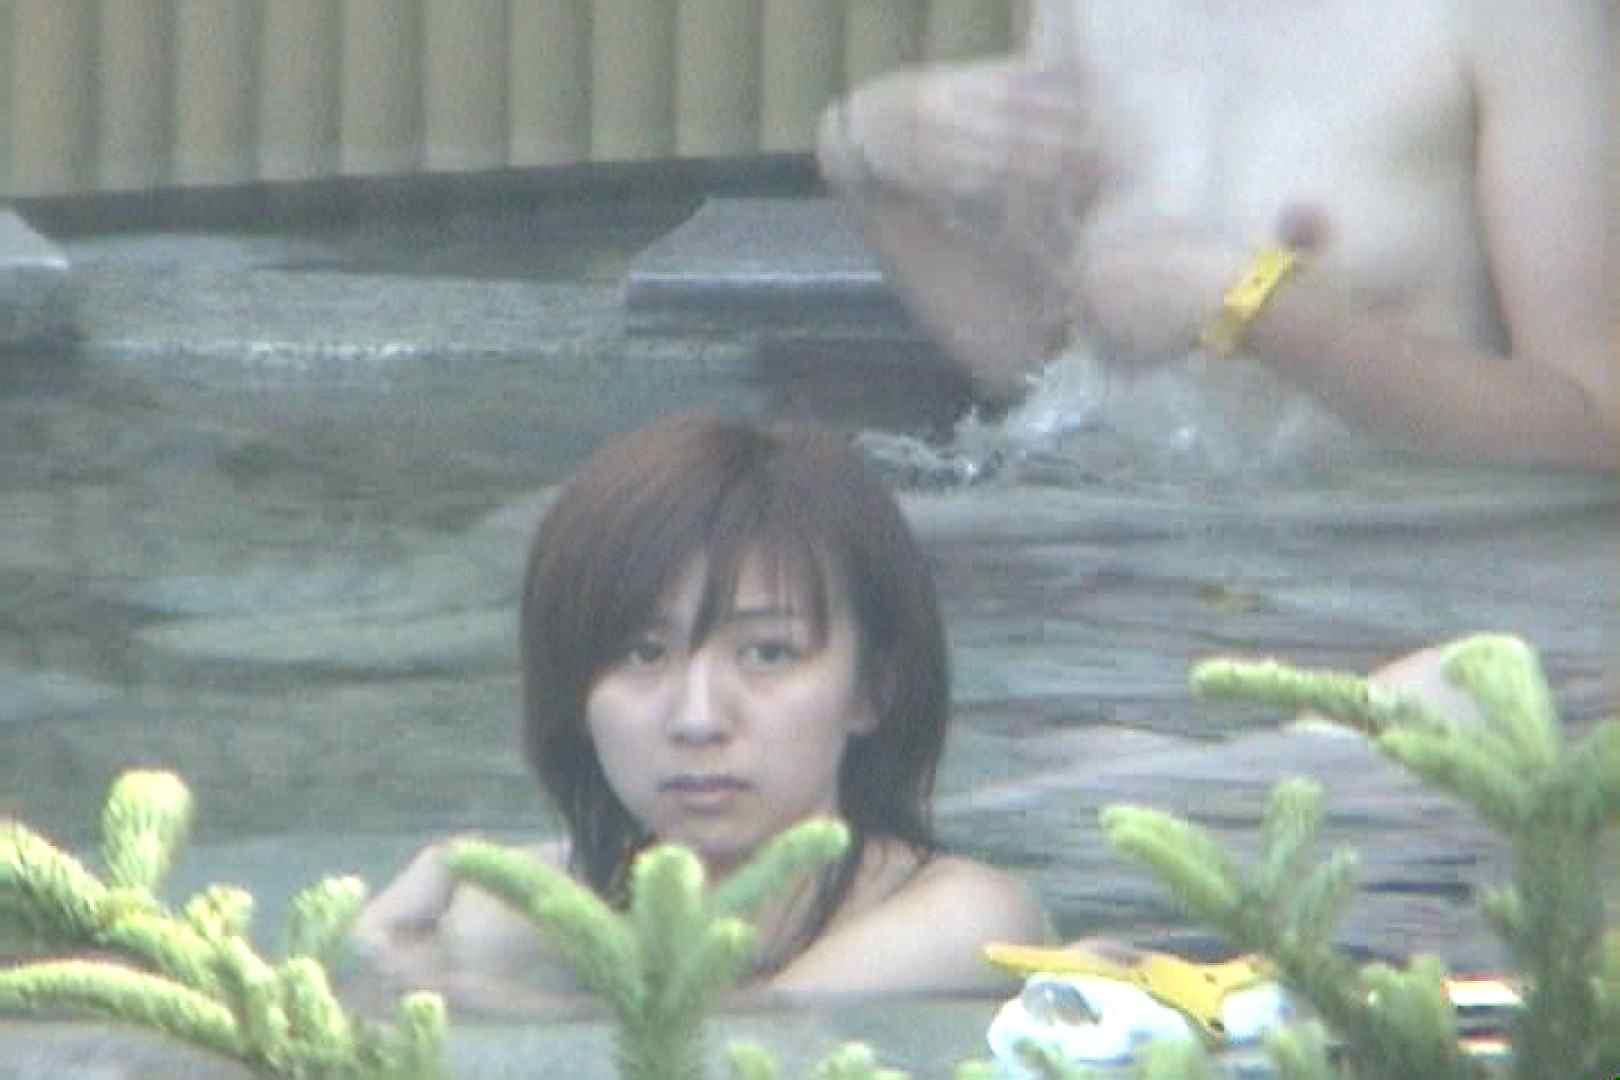 Aquaな露天風呂Vol.77【VIP限定】 盗撮   OLセックス  107画像 82